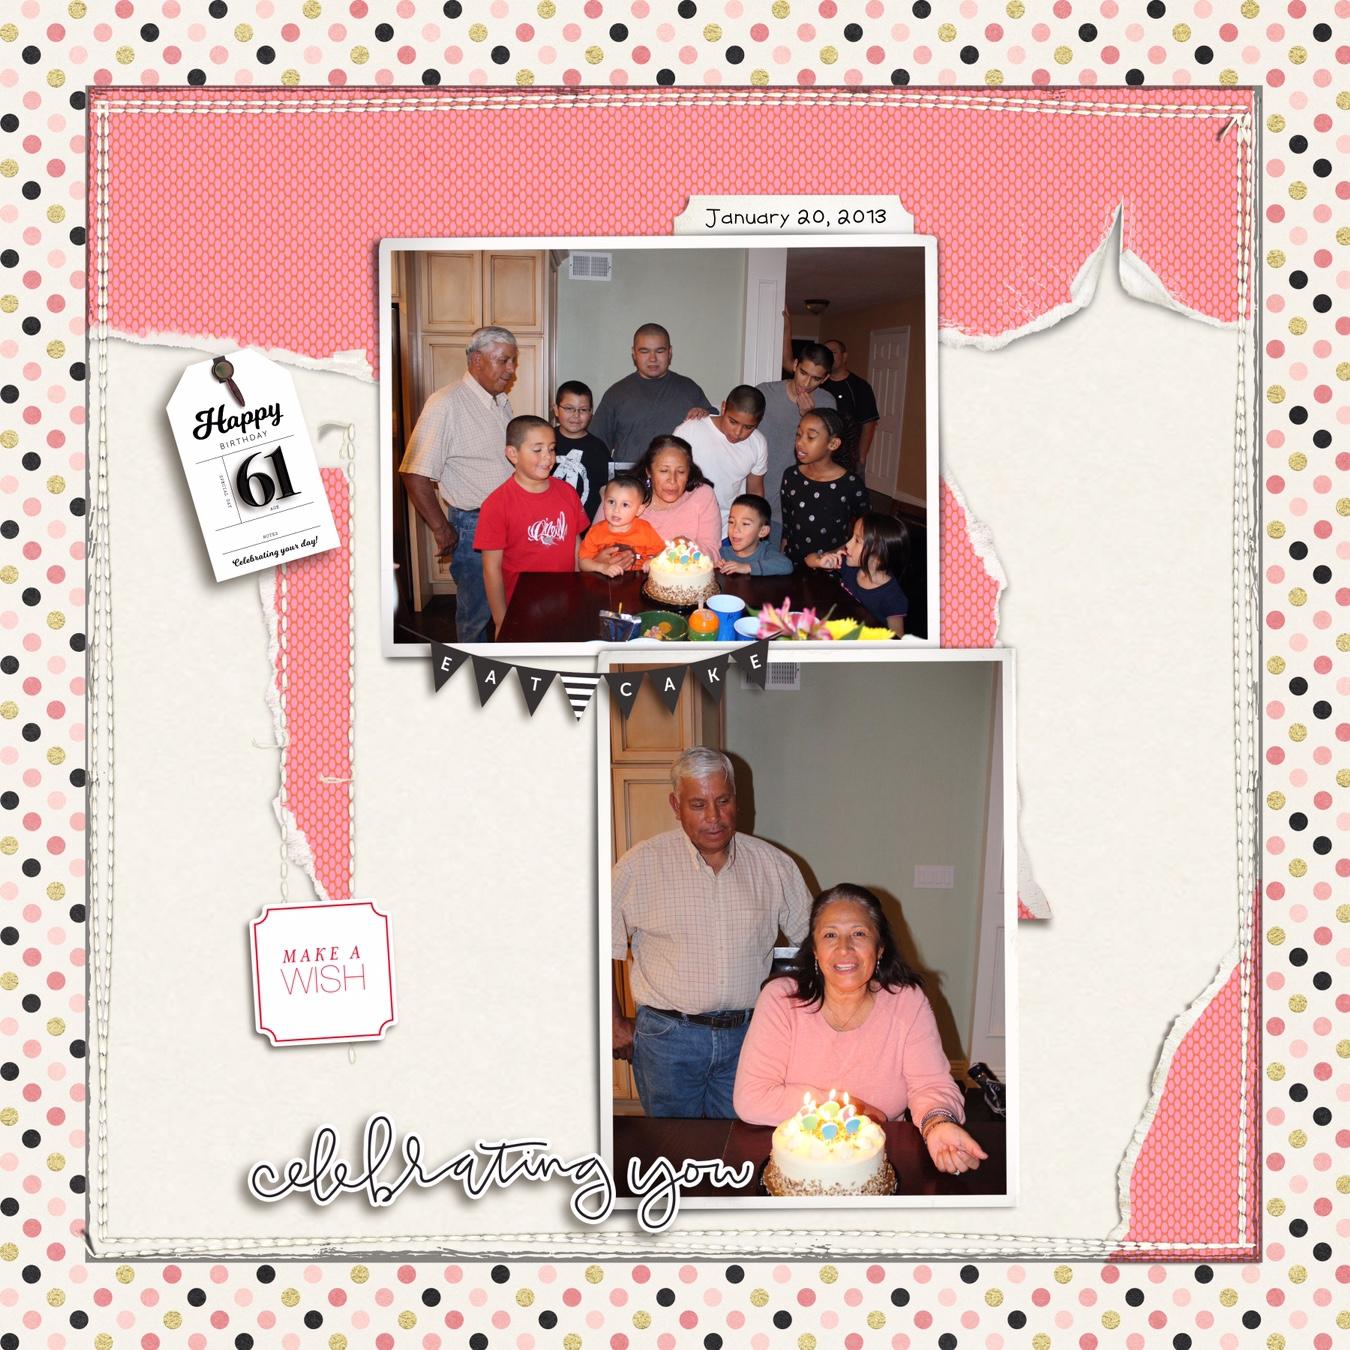 2013 Grandma's 61.jpg